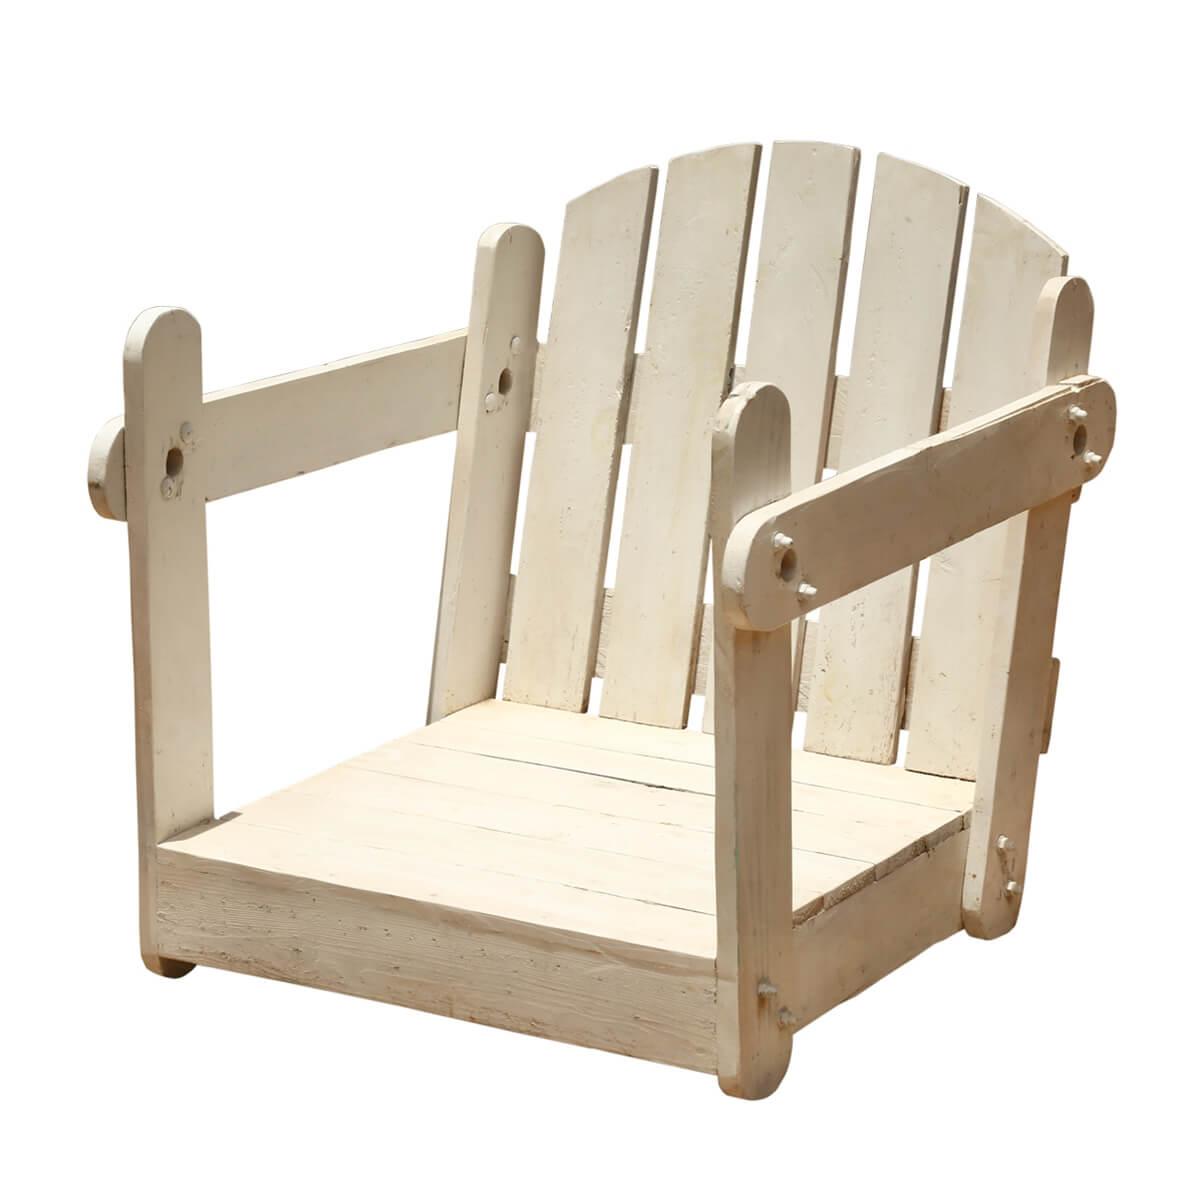 japanese patio furniture. Japanese Patio Furniture R